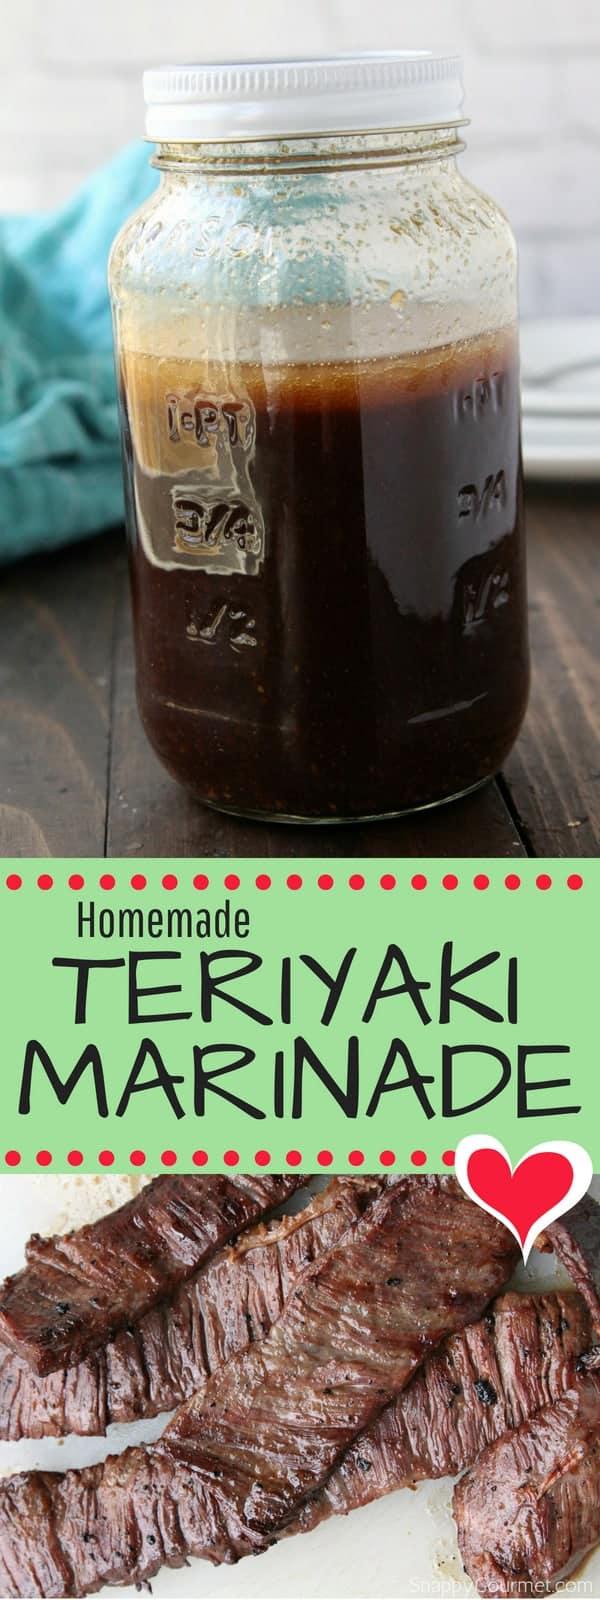 Homemade Teriyaki Marinade recipe for beef, chicken or pork